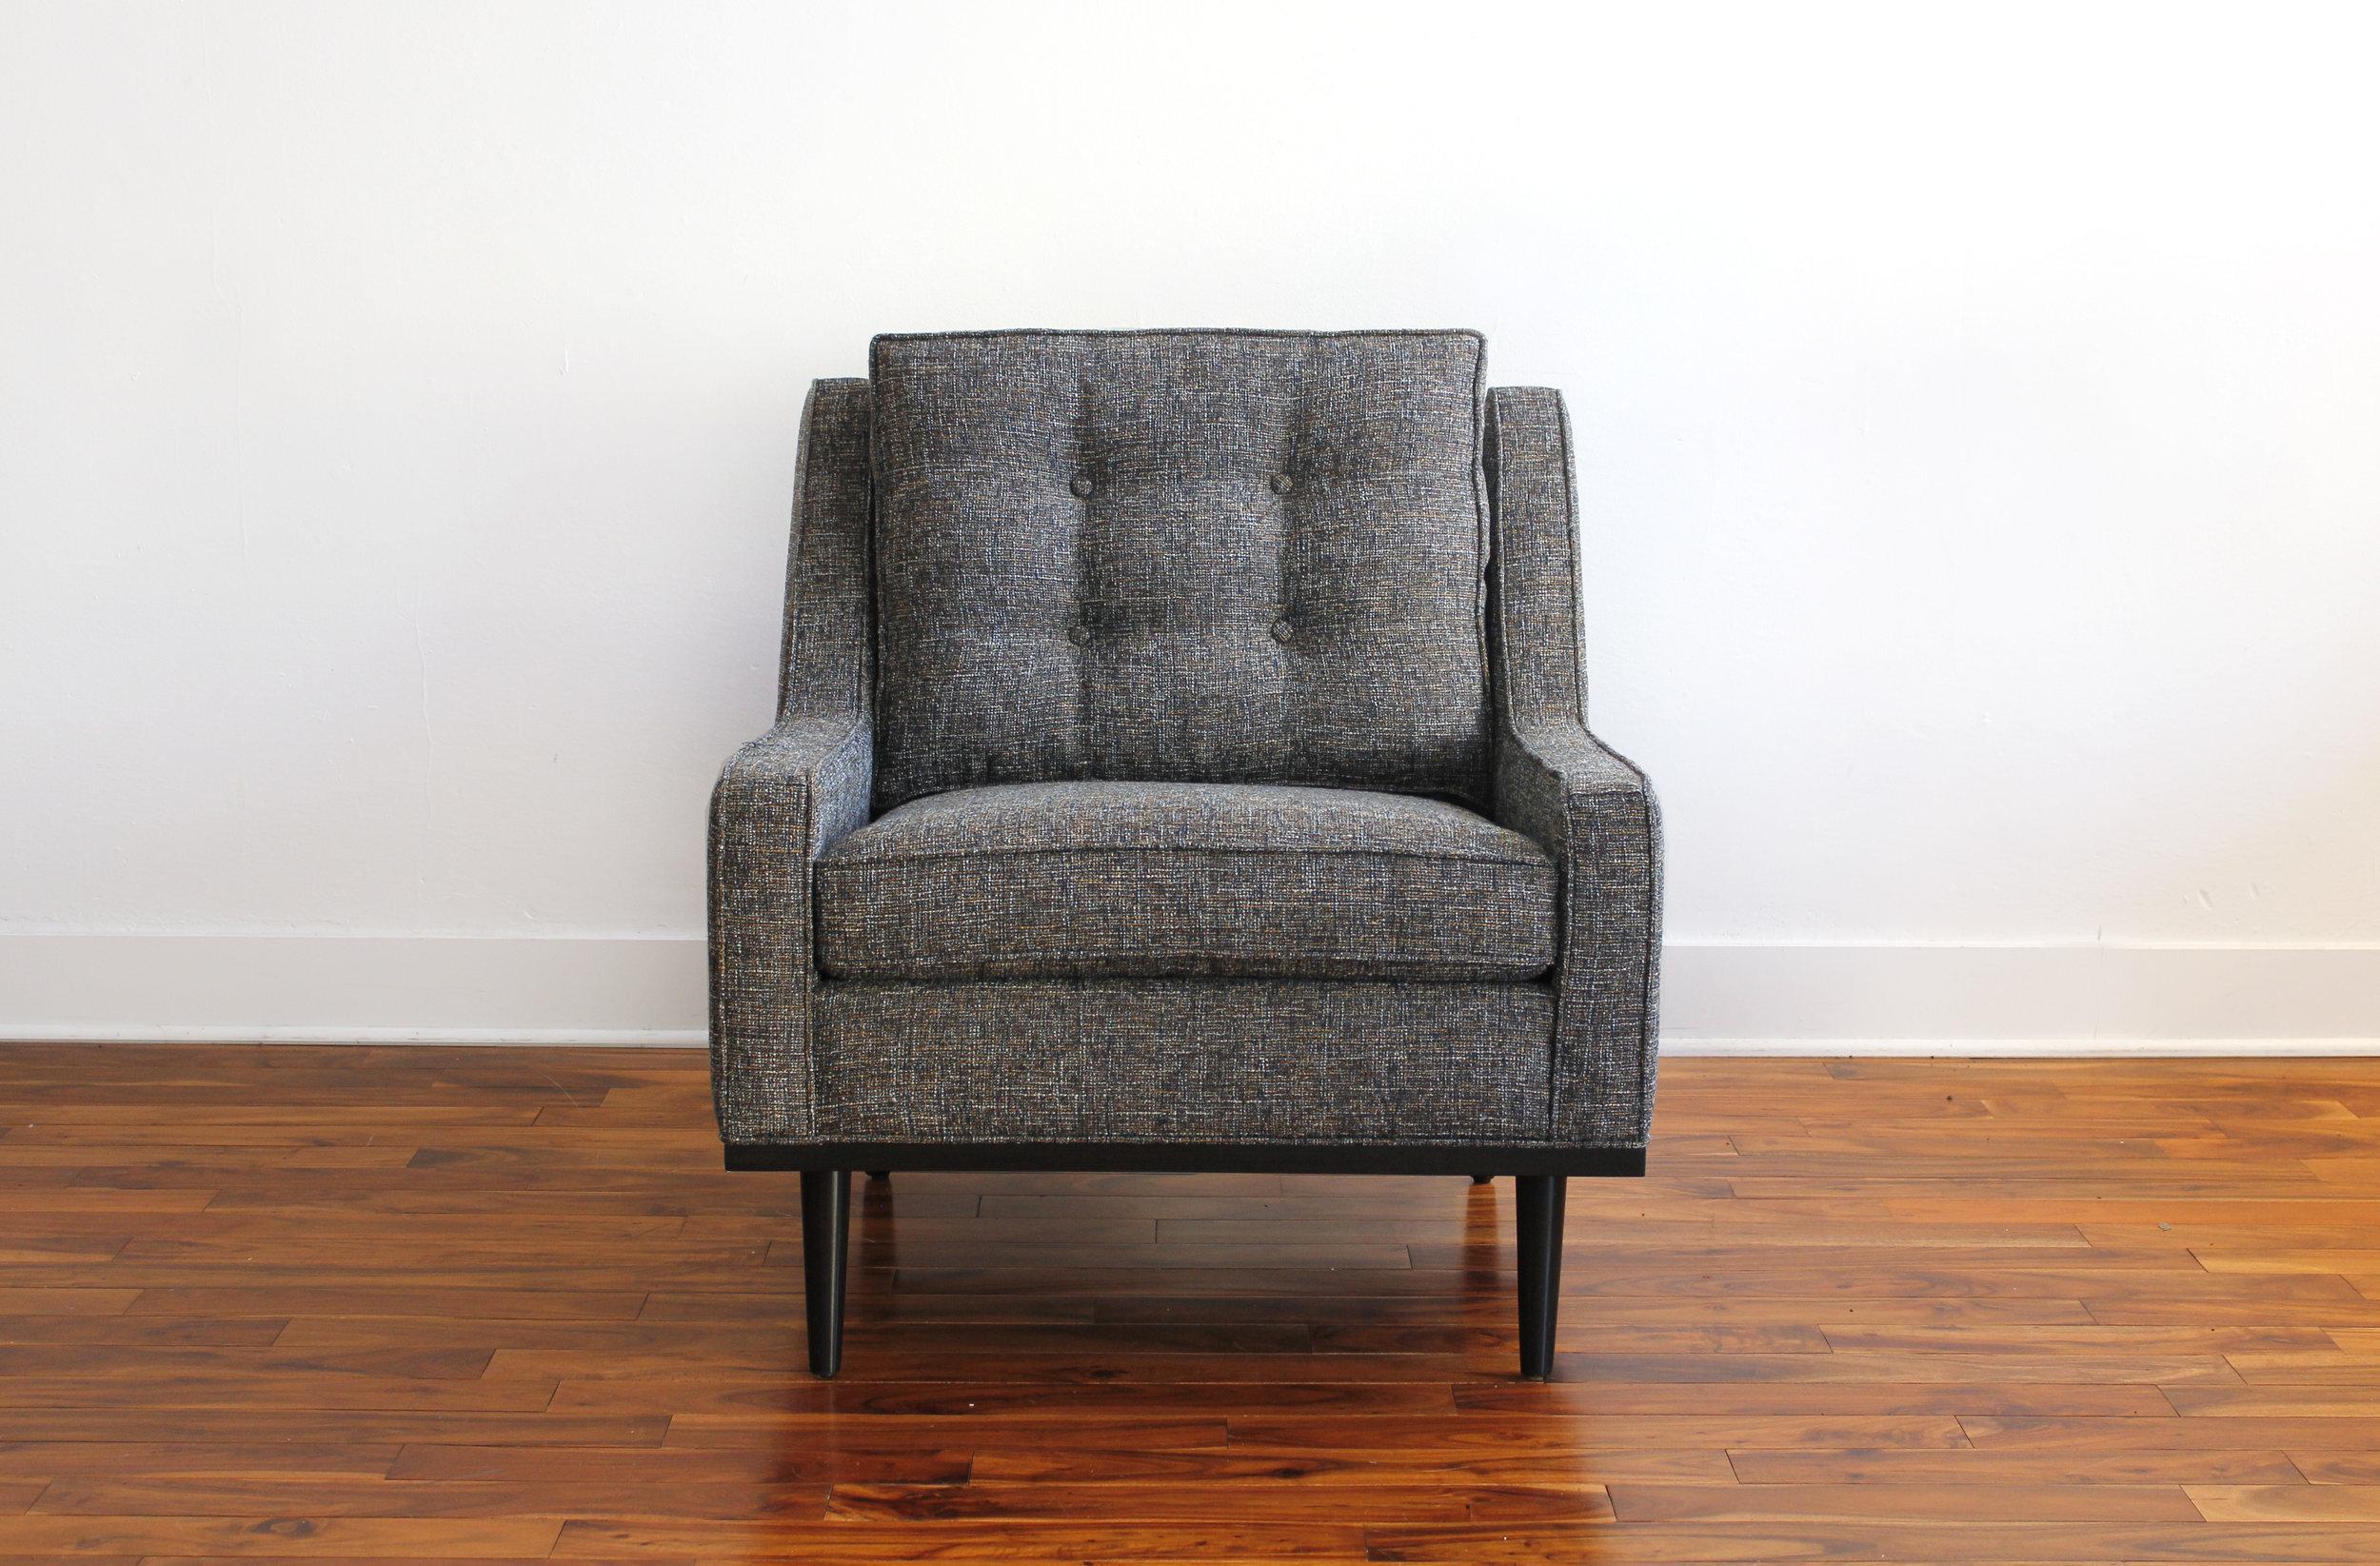 The Scholar Chair